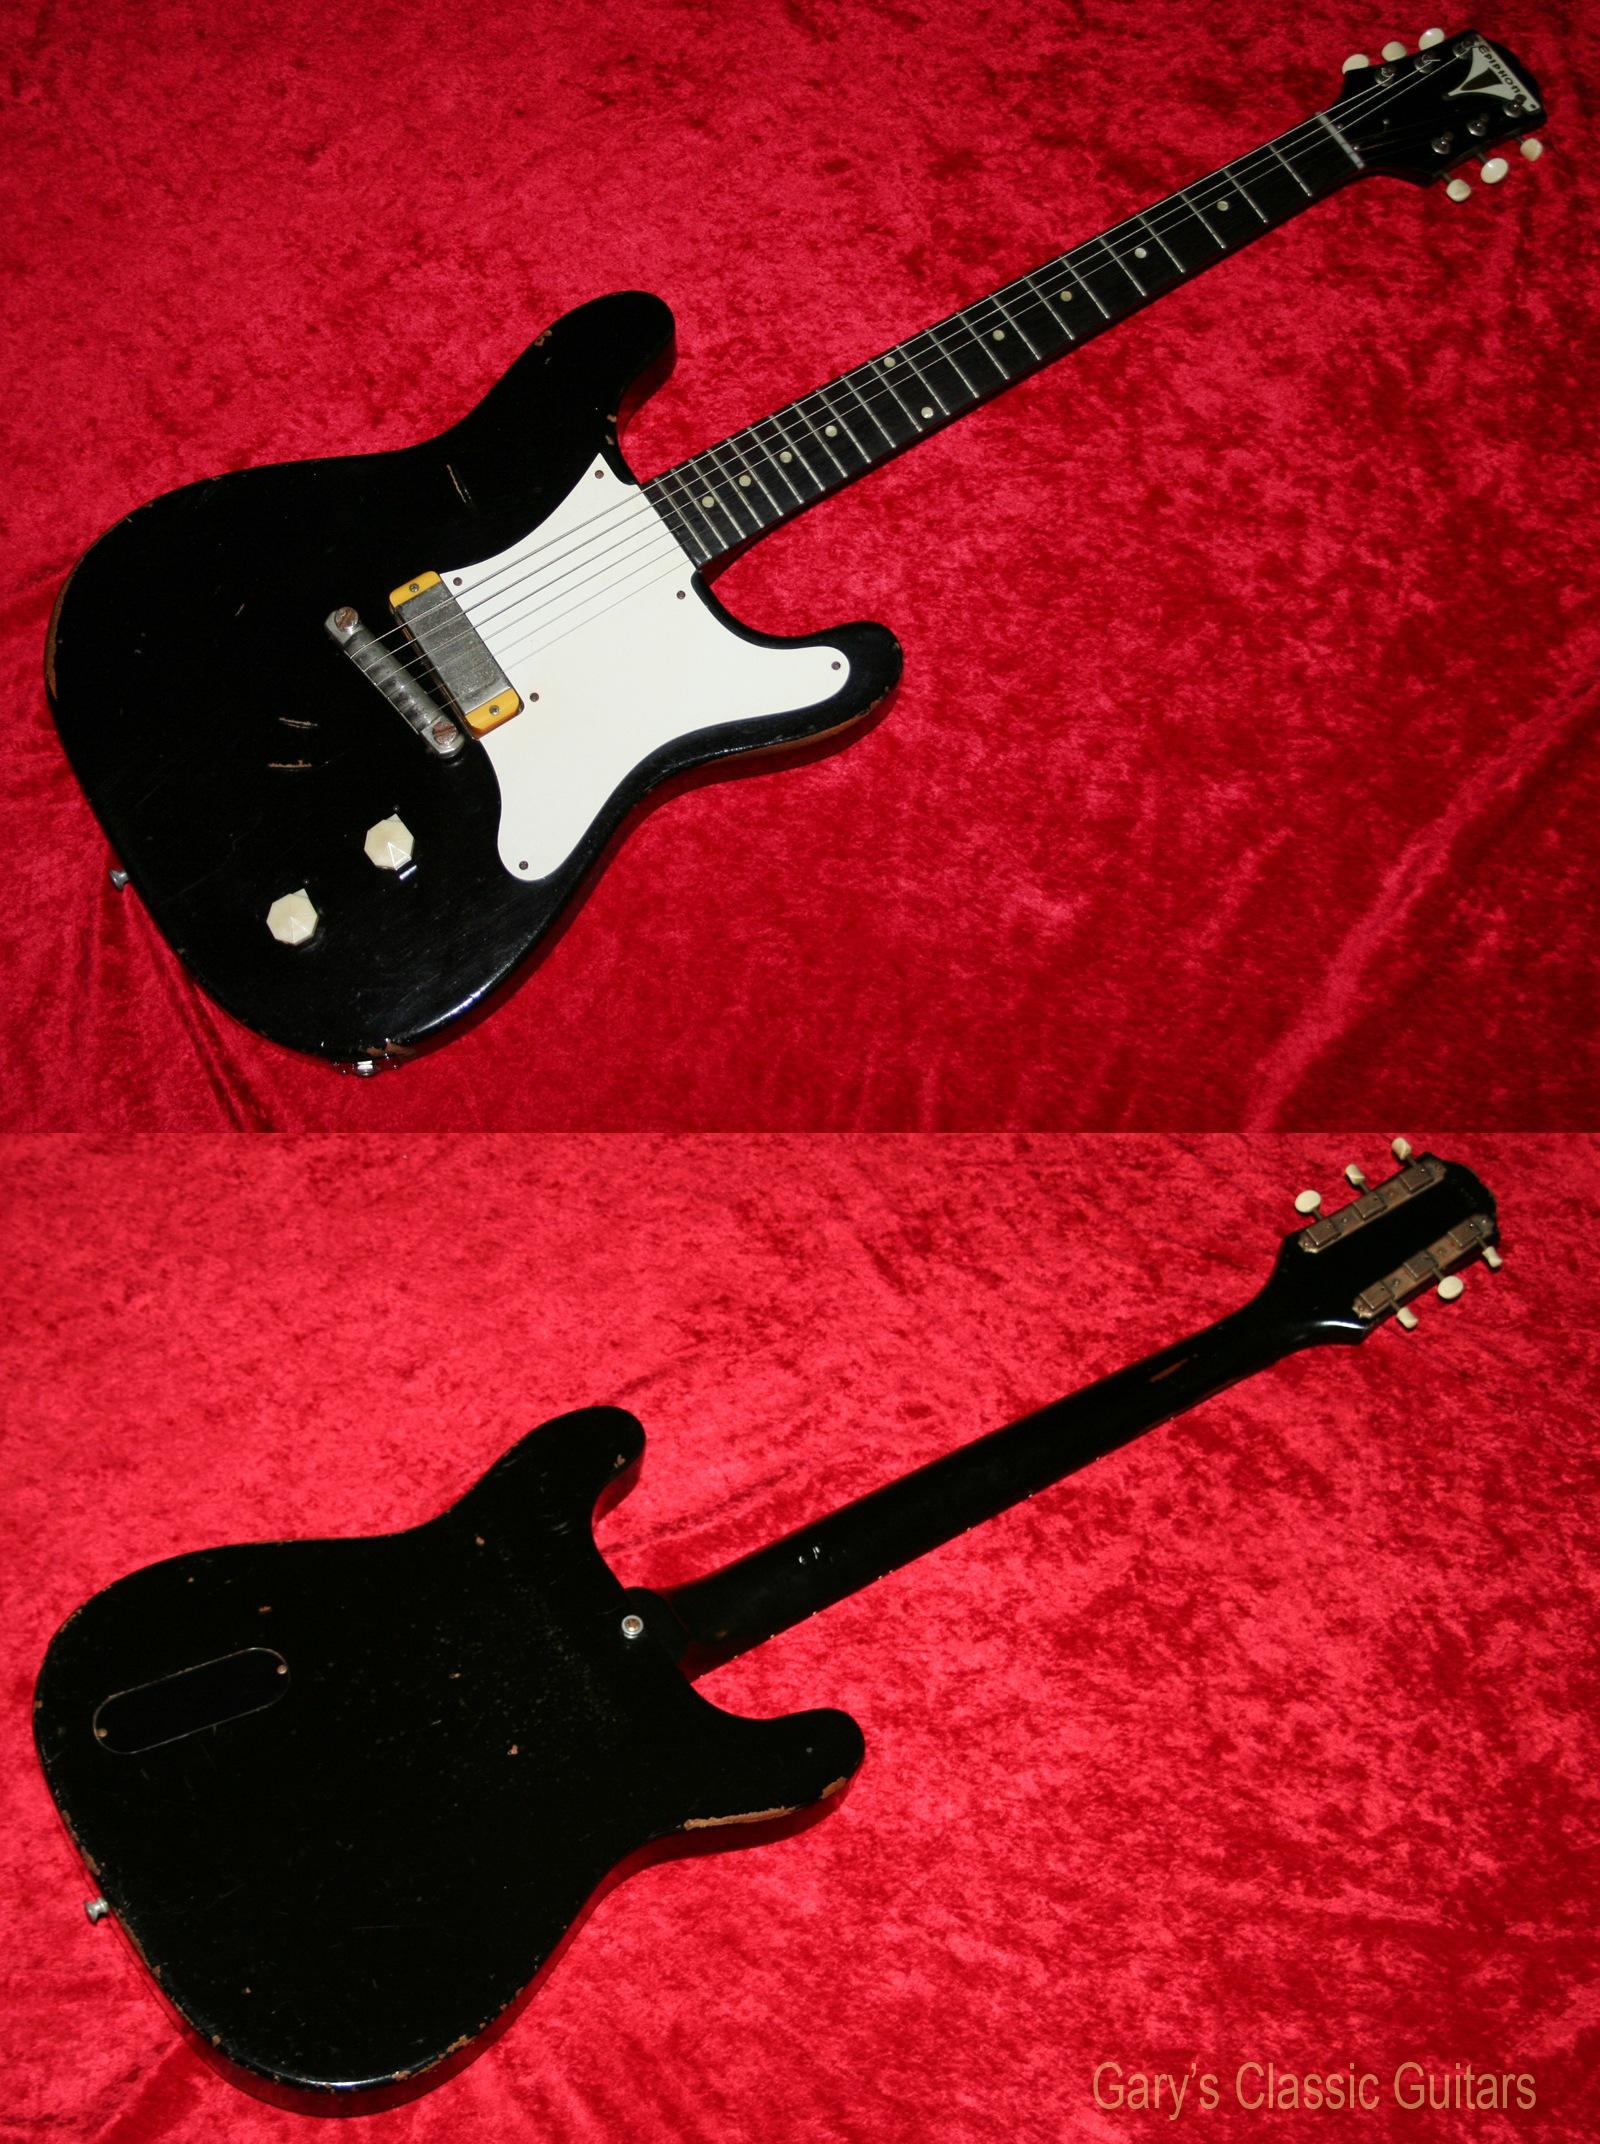 1959 Epiphone Coronet | Garys Classic Guitars & Vintage